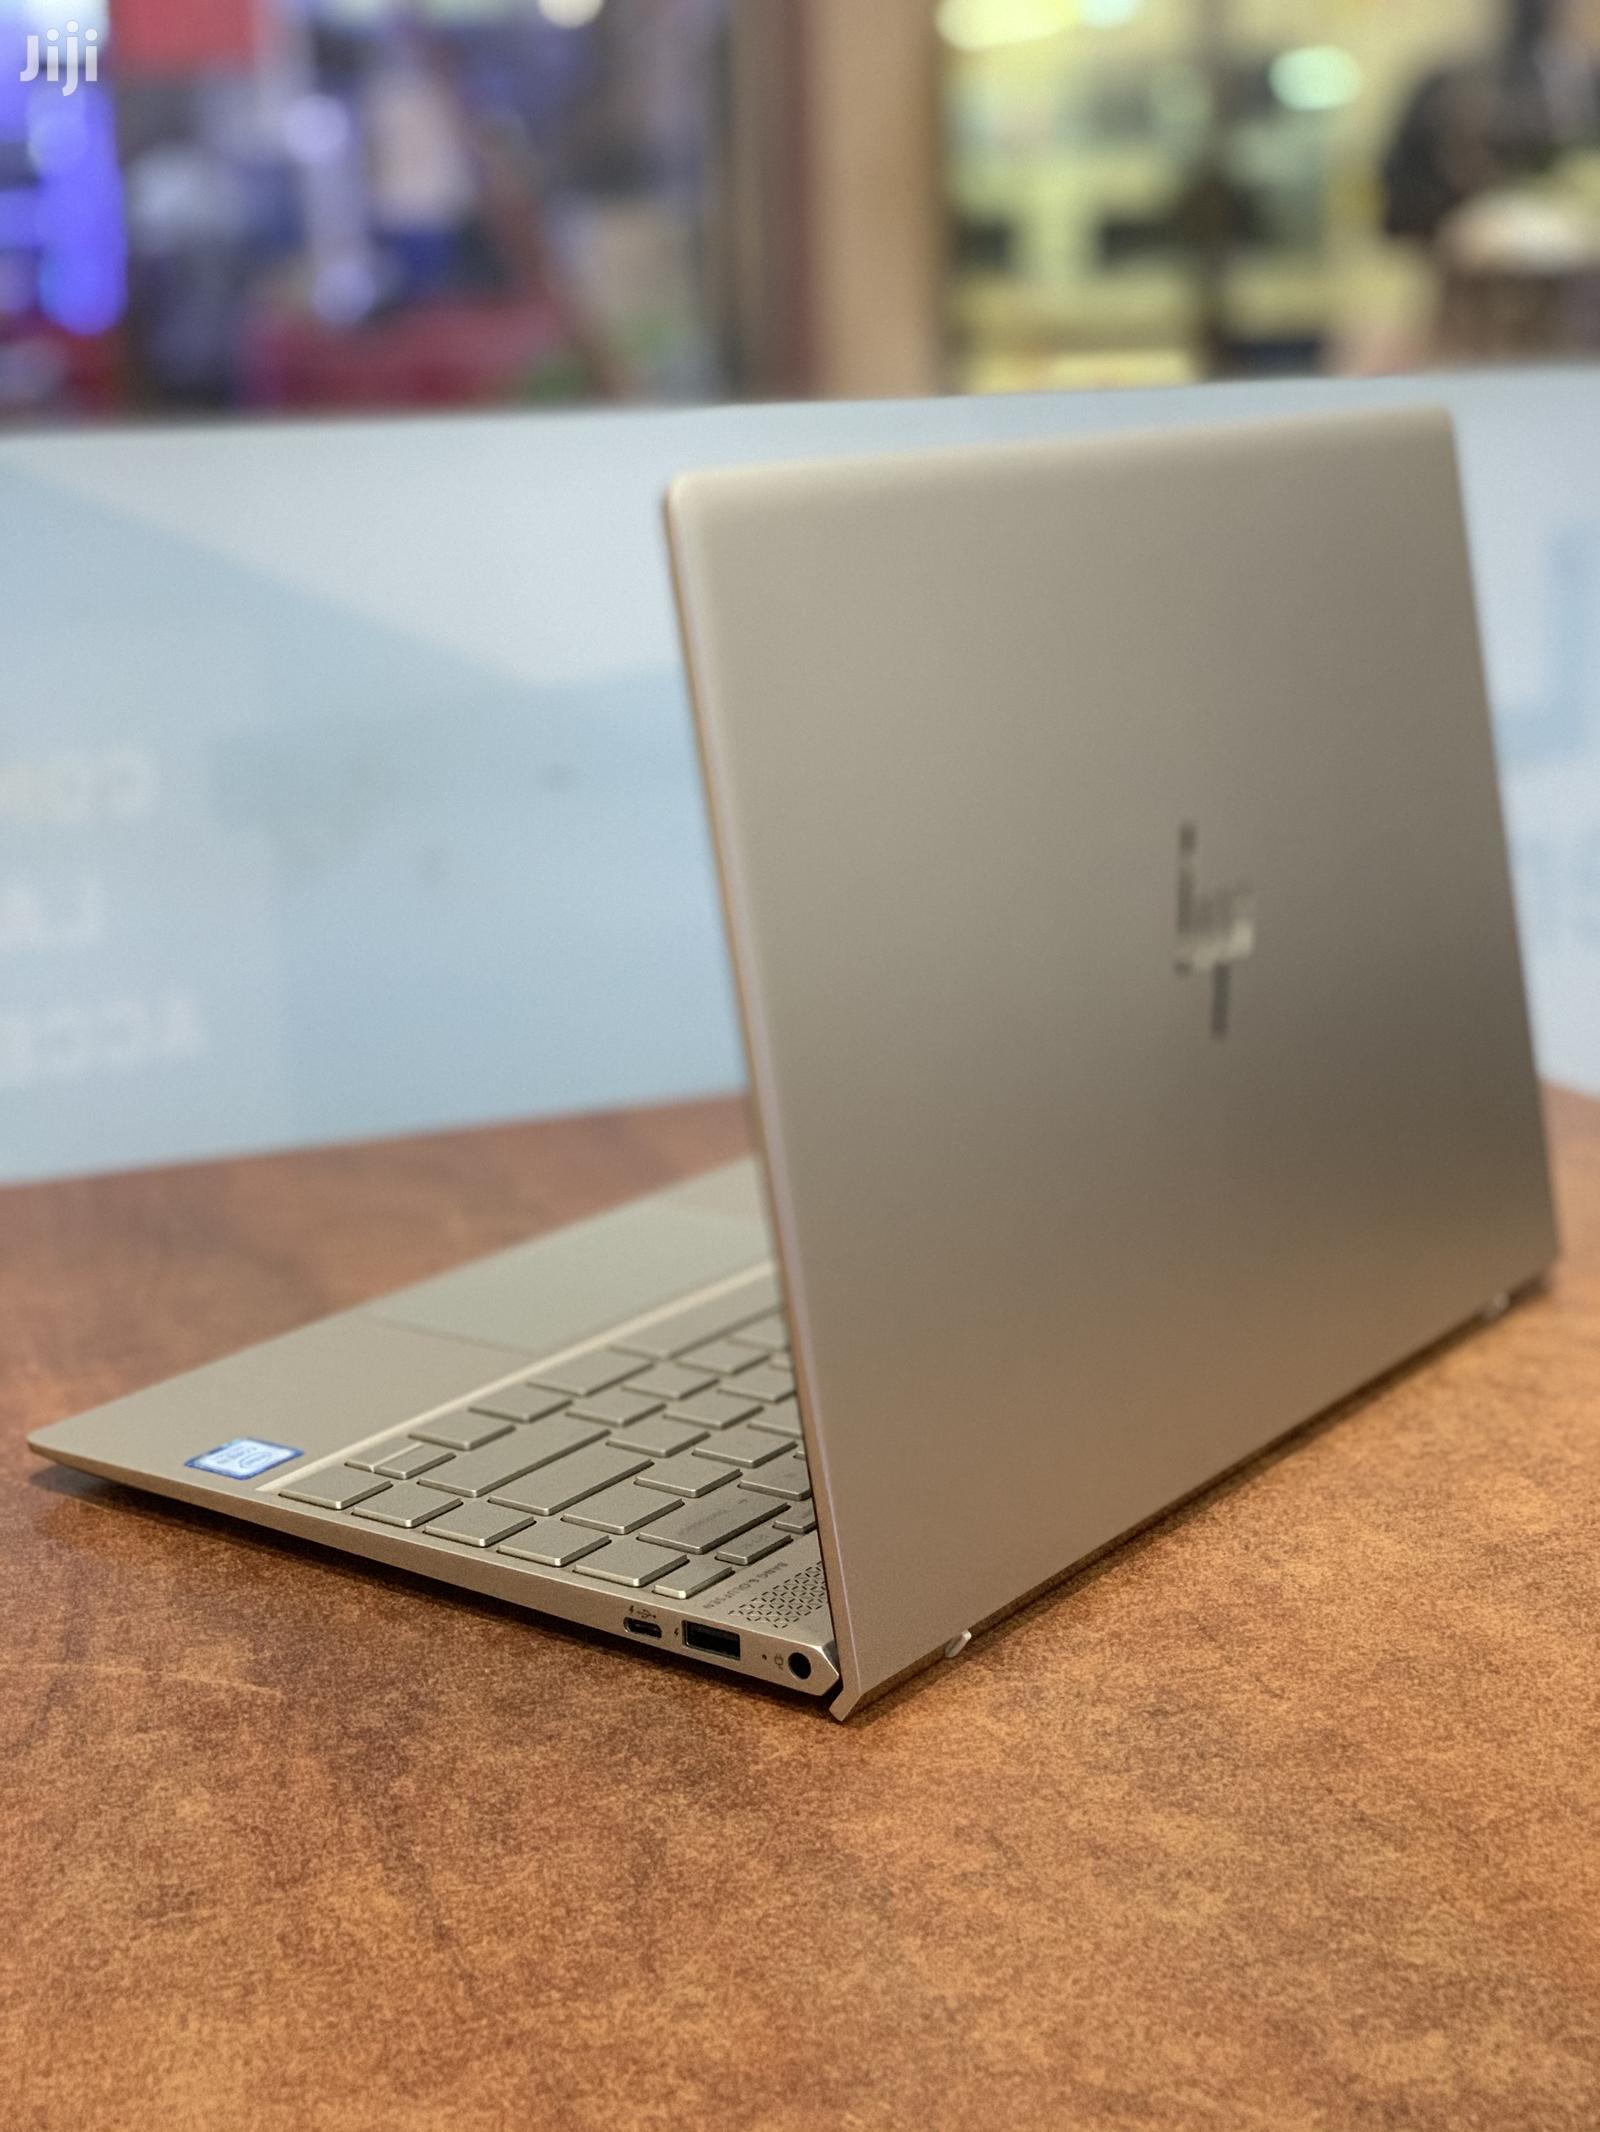 New Laptop HP Envy 13 8GB Intel Core I5 SSHD (Hybrid) 256GB | Laptops & Computers for sale in Kampala, Central Region, Uganda